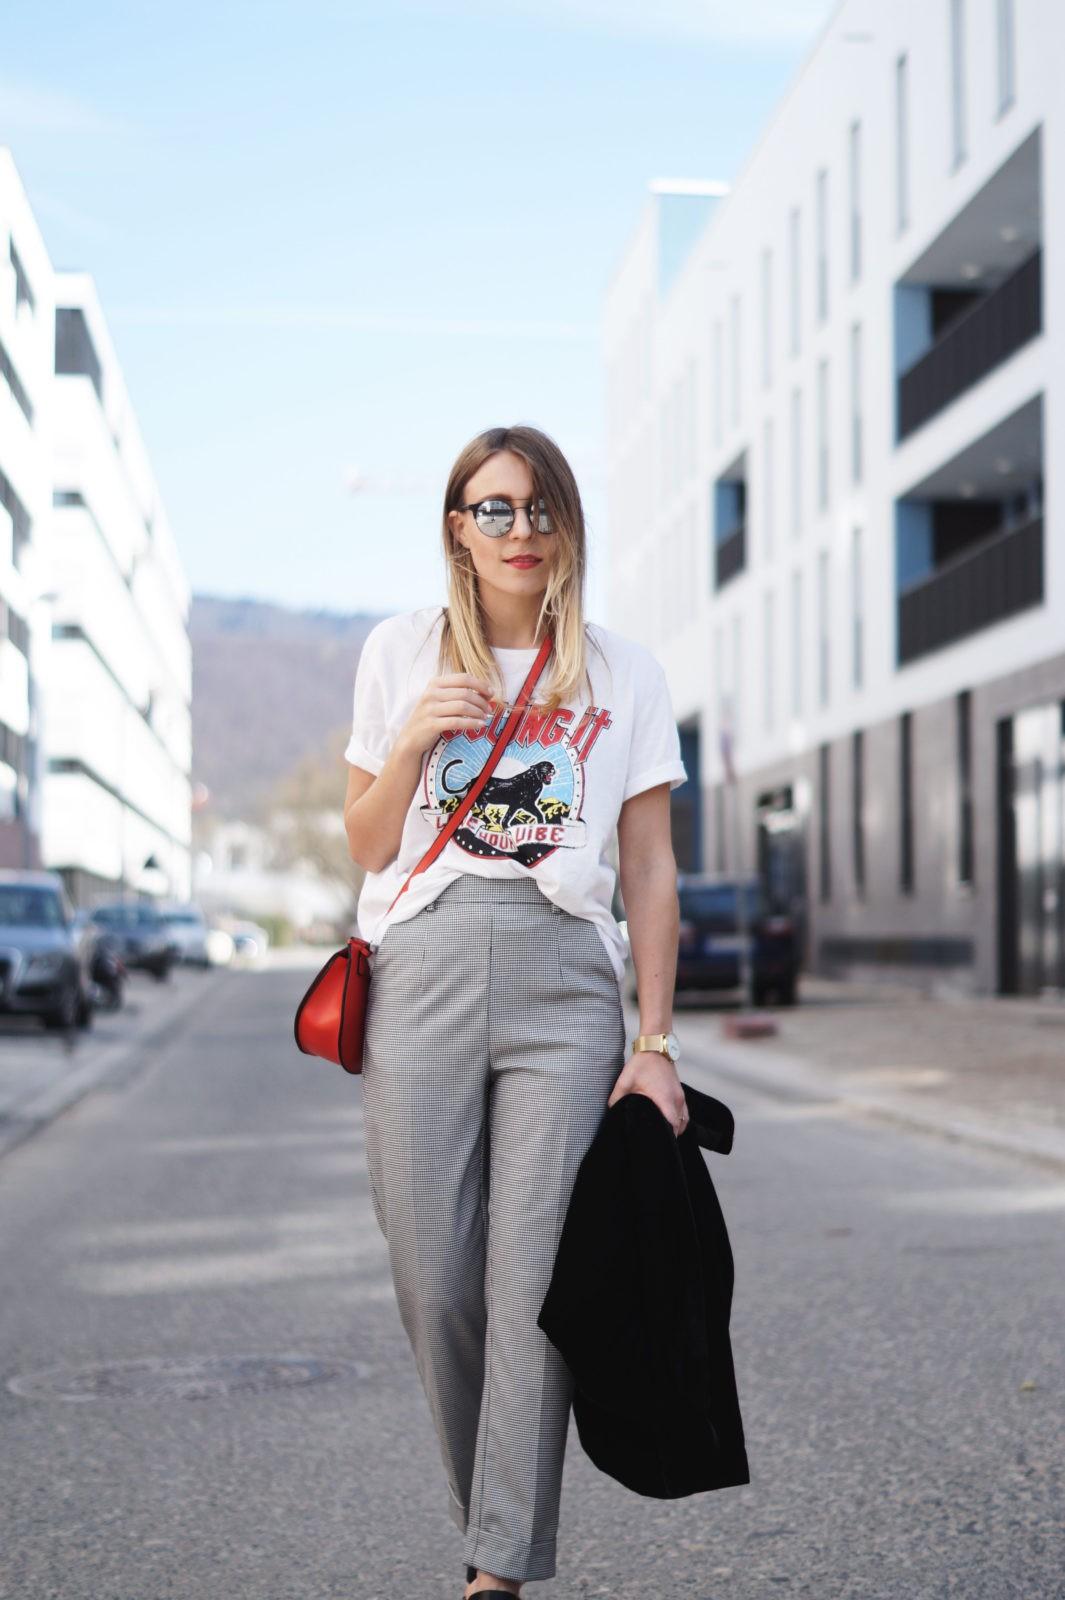 Slogan Shirt Pop of Red Outfit Fashionblogger Sariety Modeblog Heidelberg Bandshirt Karohose rote Tasche Streetstyle Bahnstadt